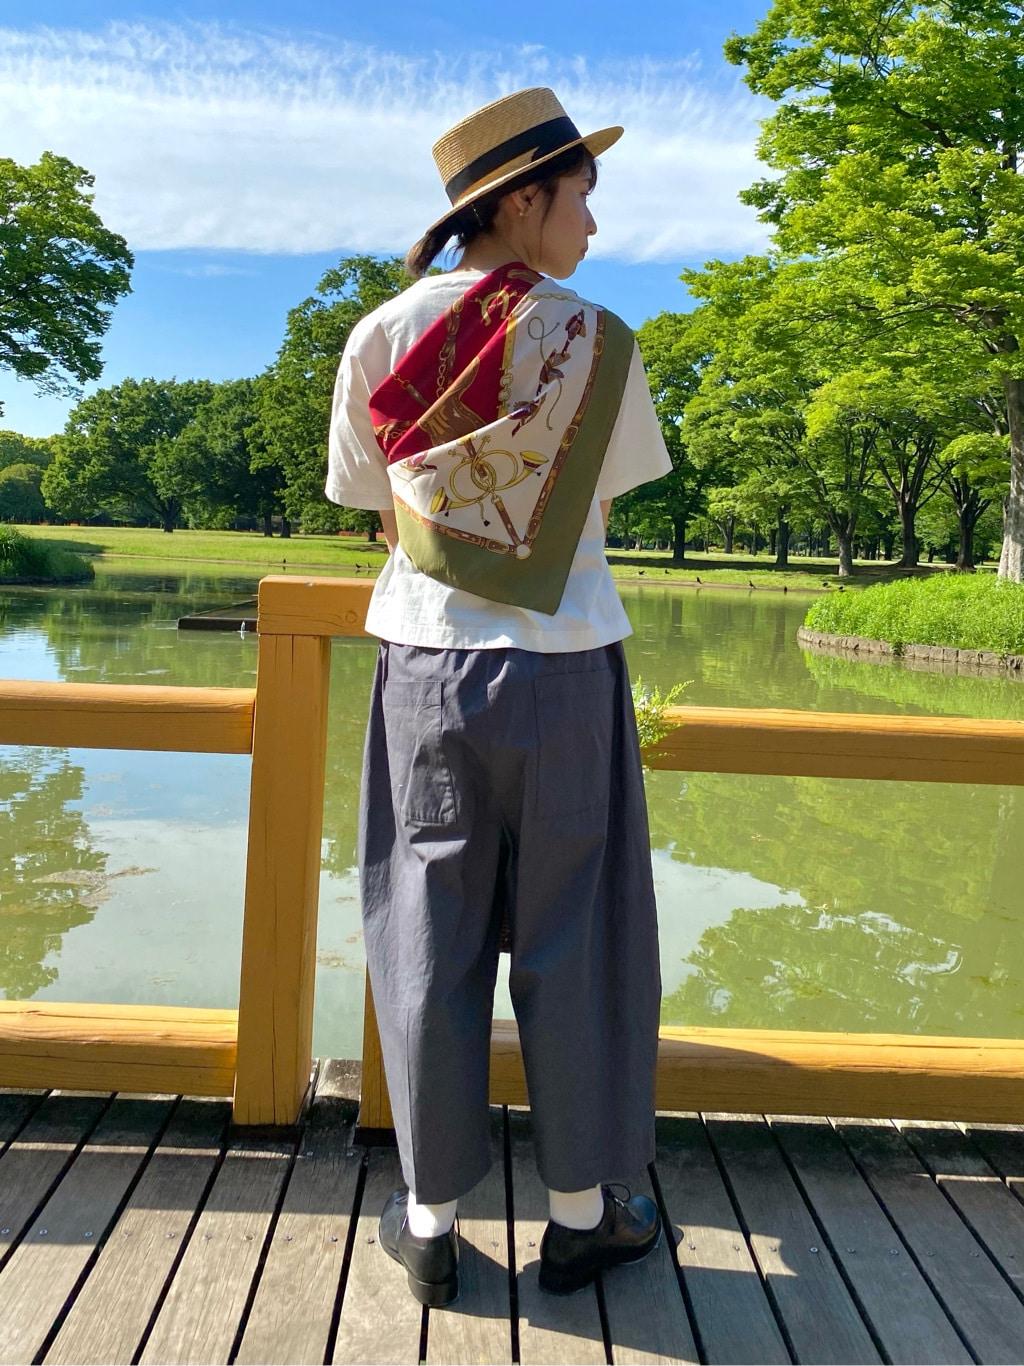 bulle de savon 新宿ミロード 身長:157cm 2021.05.13